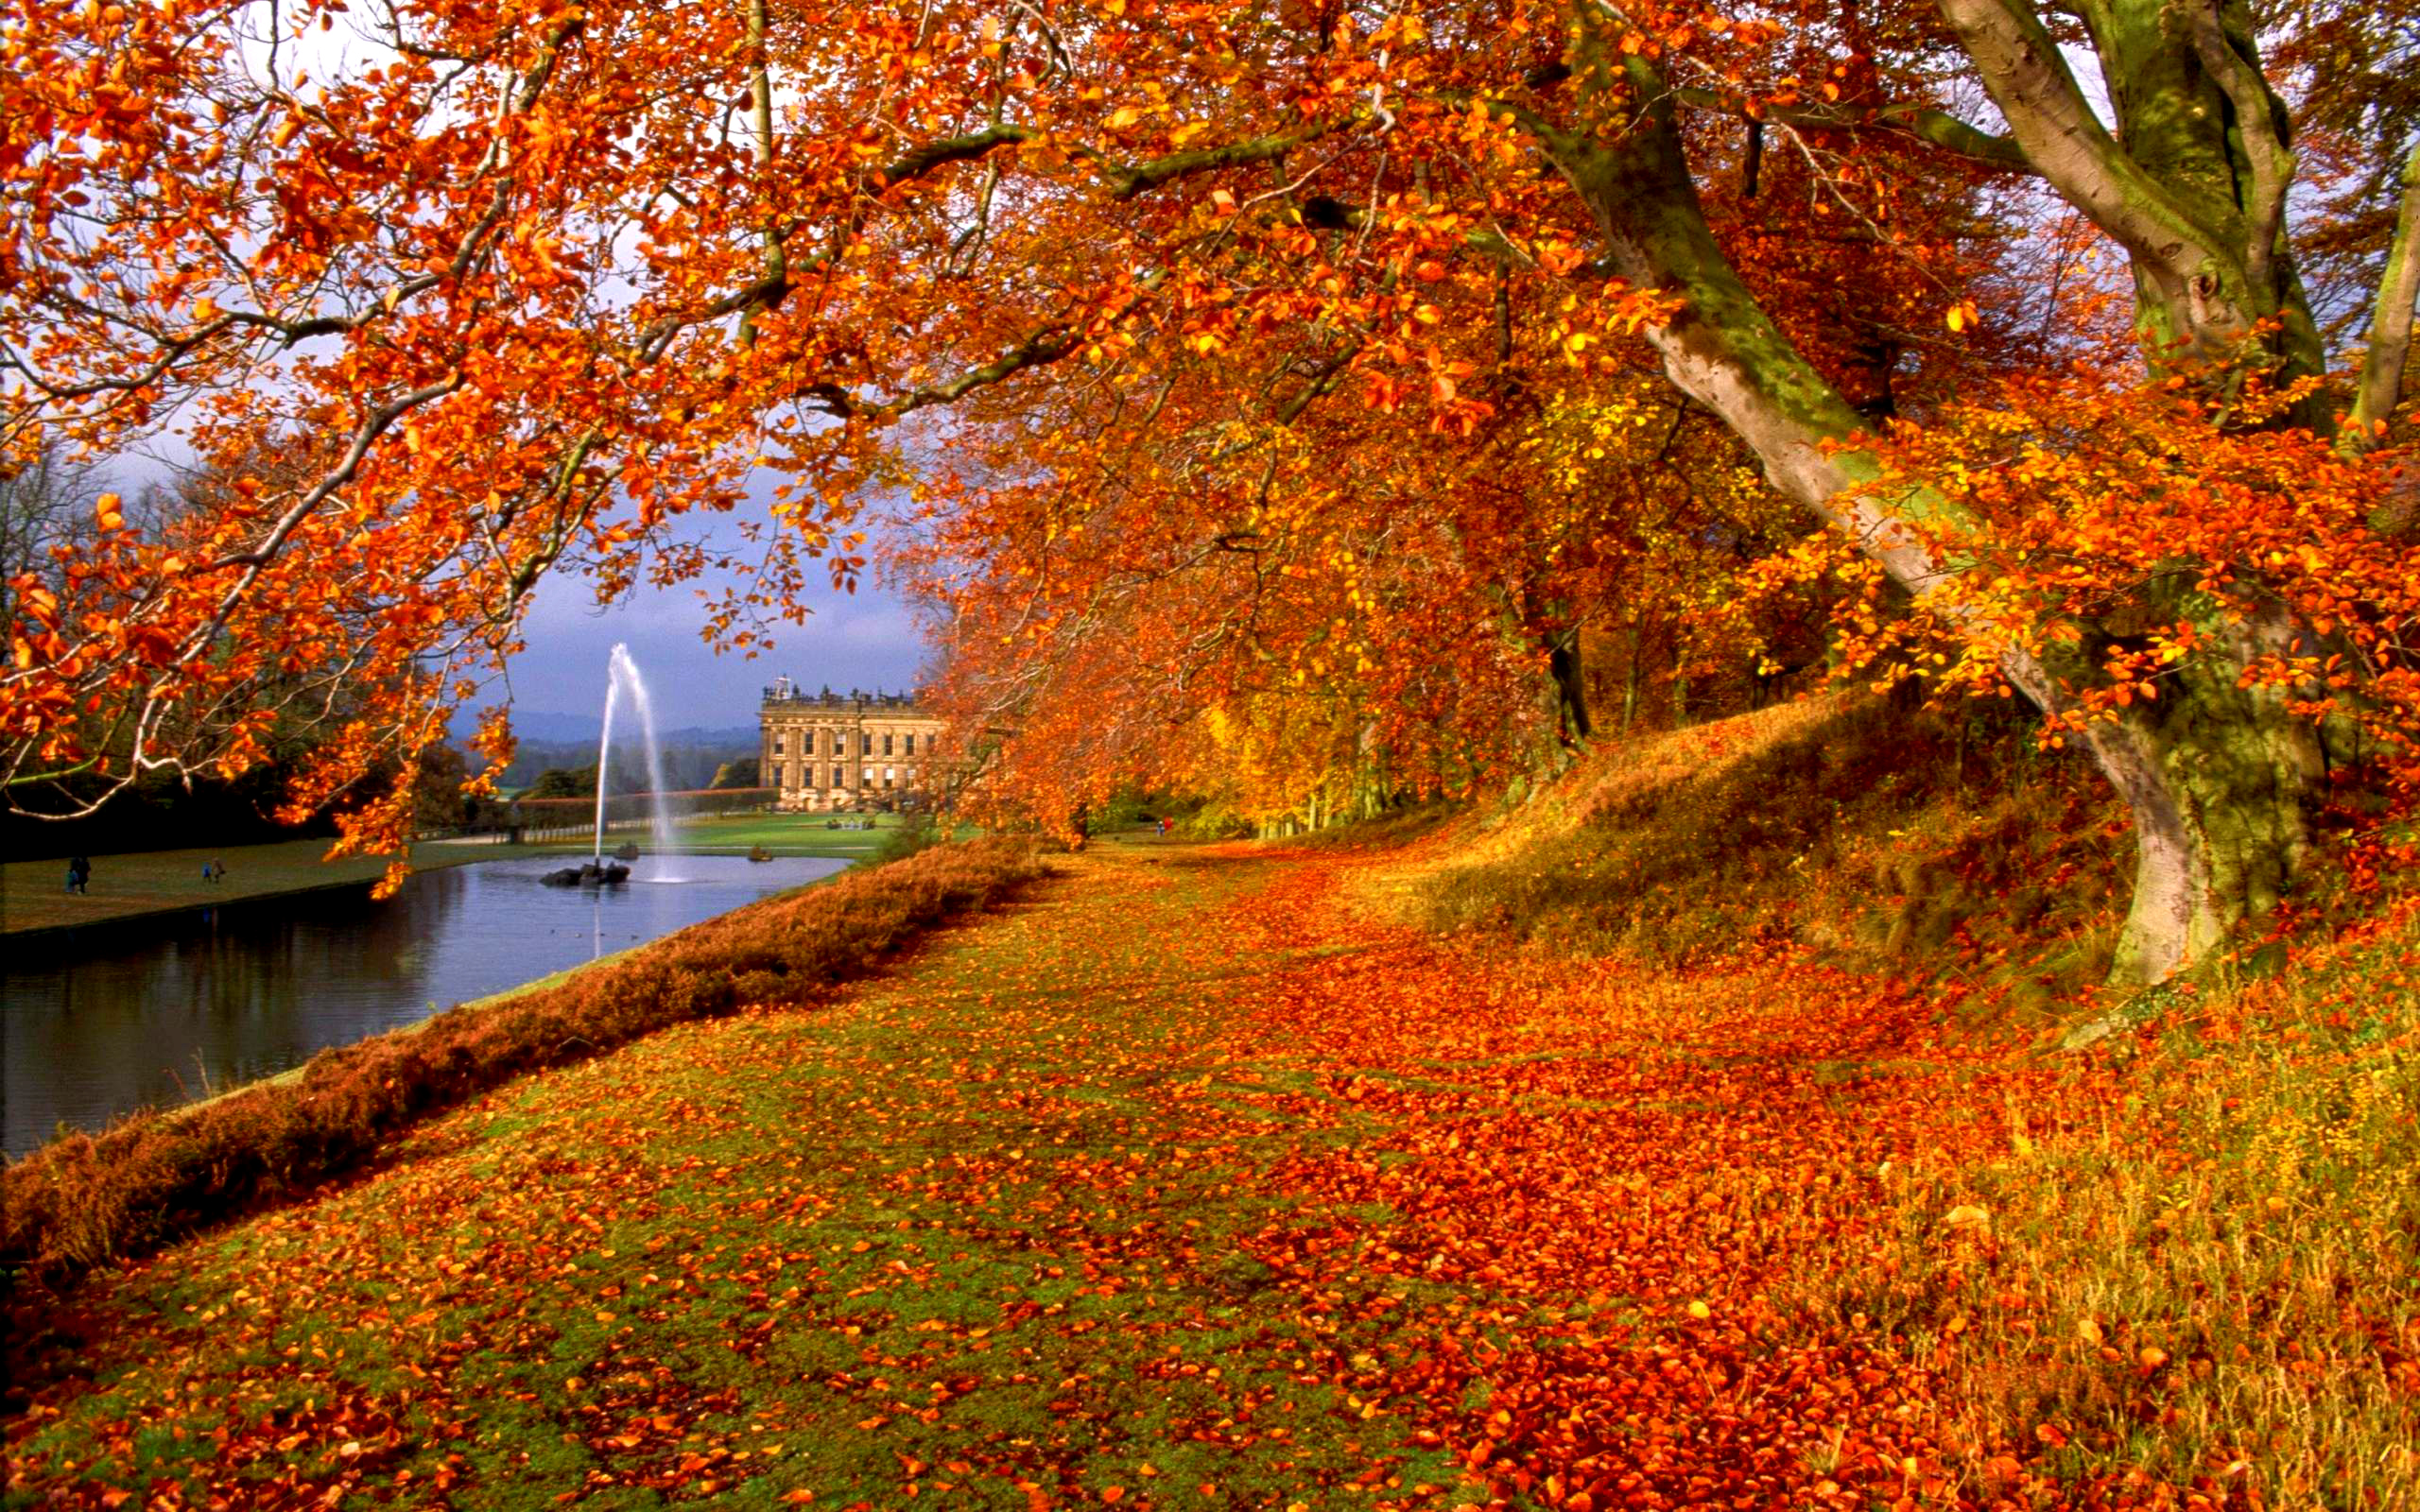 autumn Wallpaper Background 38304 2560x1600